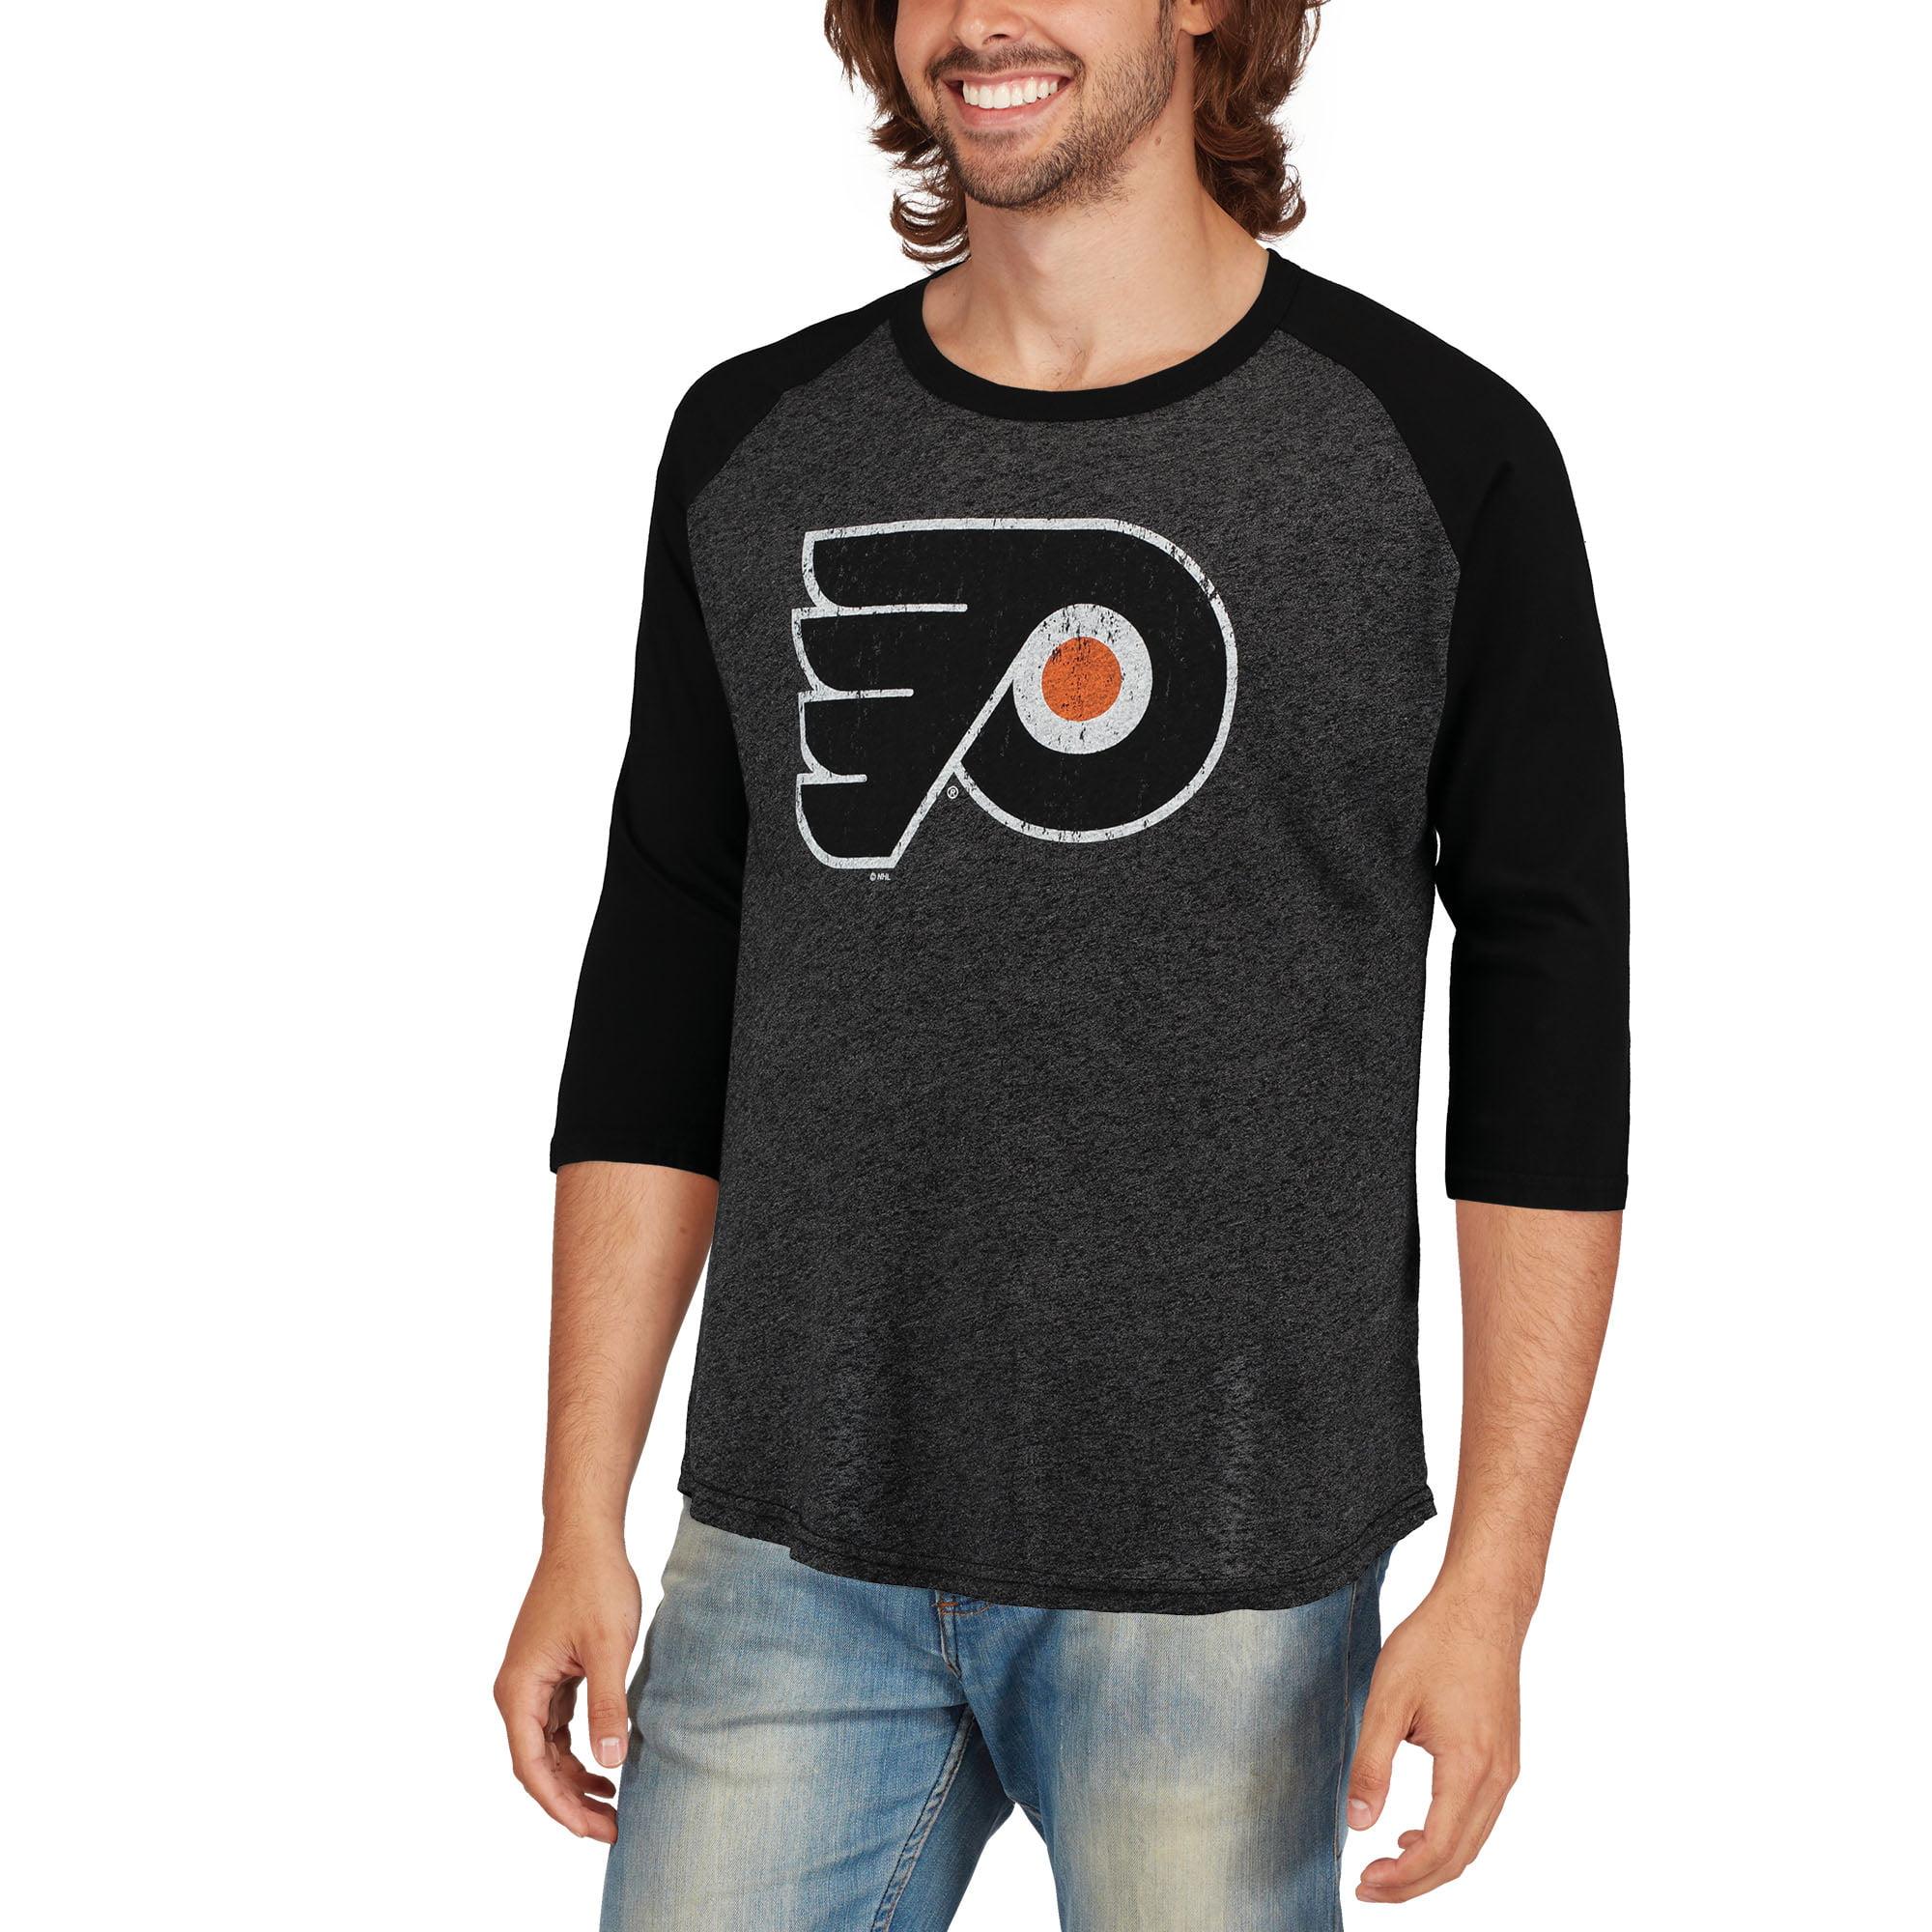 46ee665a6 Philadelphia Flyers Majestic Threads Tri-Blend 3 4-Sleeve Raglan T-Shirt -  Black - Walmart.com